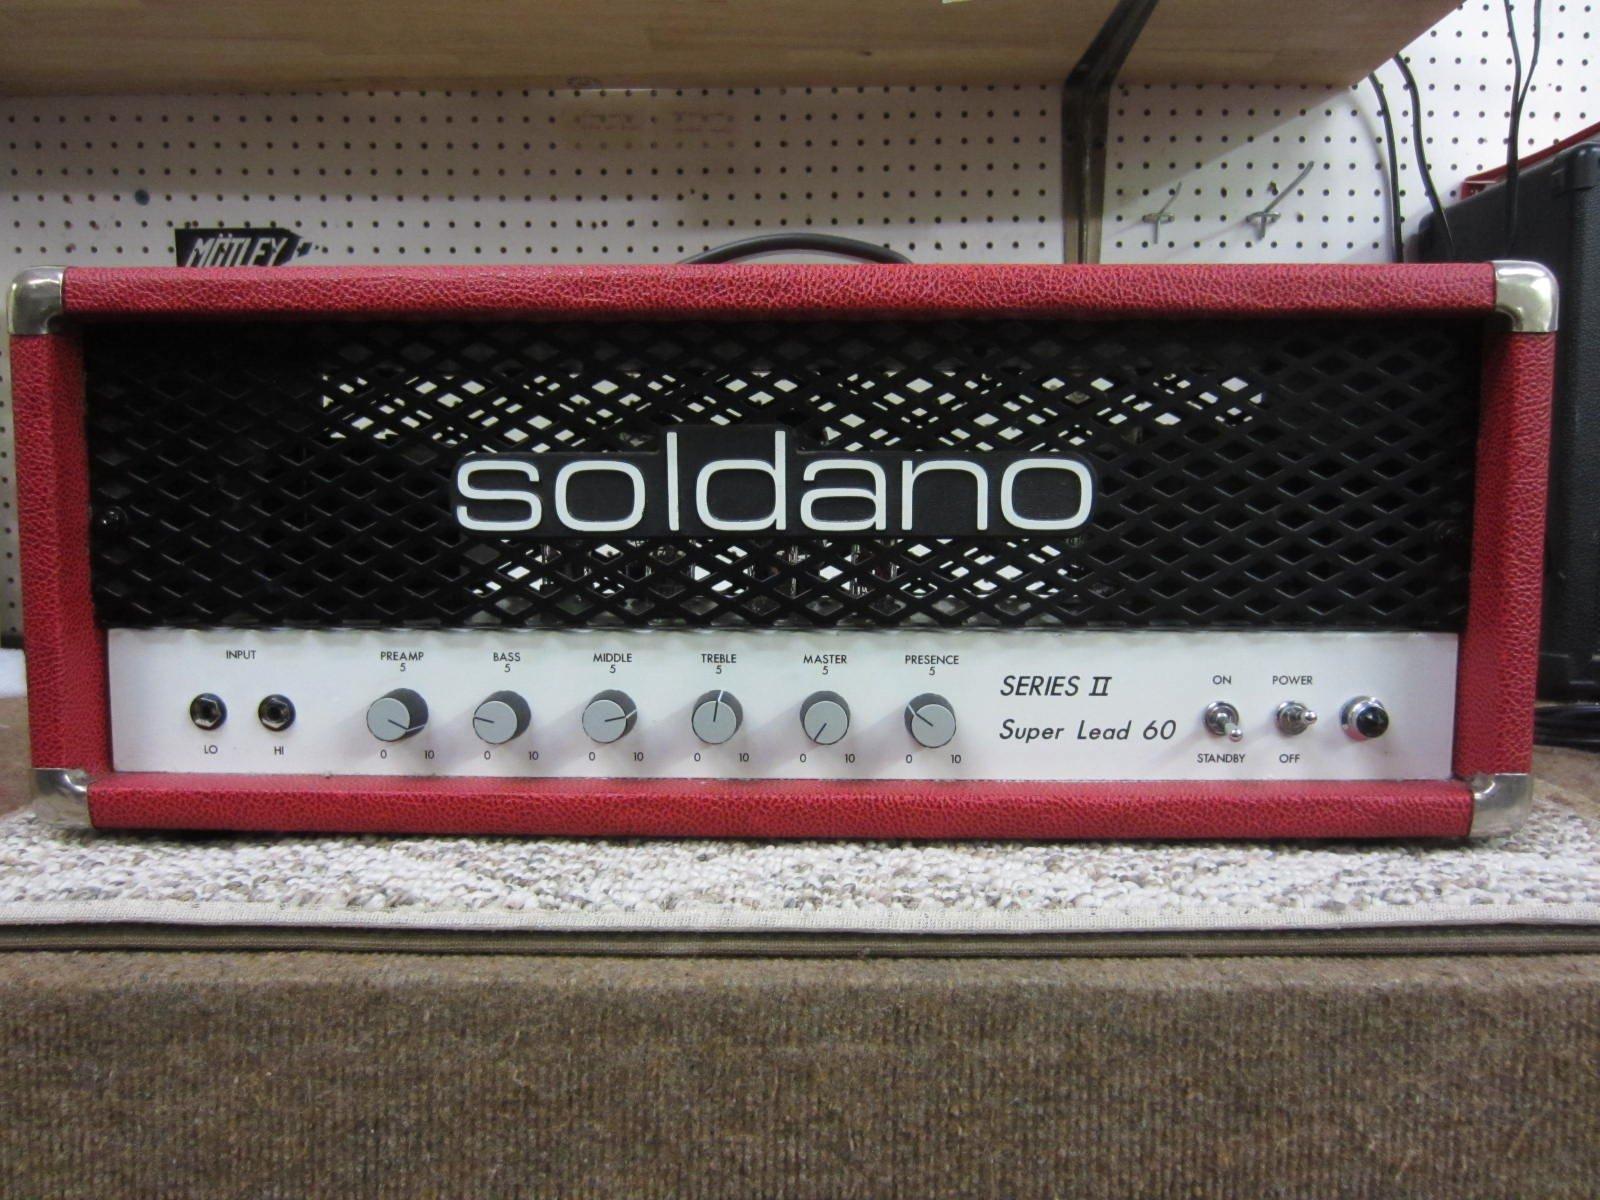 Soldano Series II Super Lead 60 Red Tolex